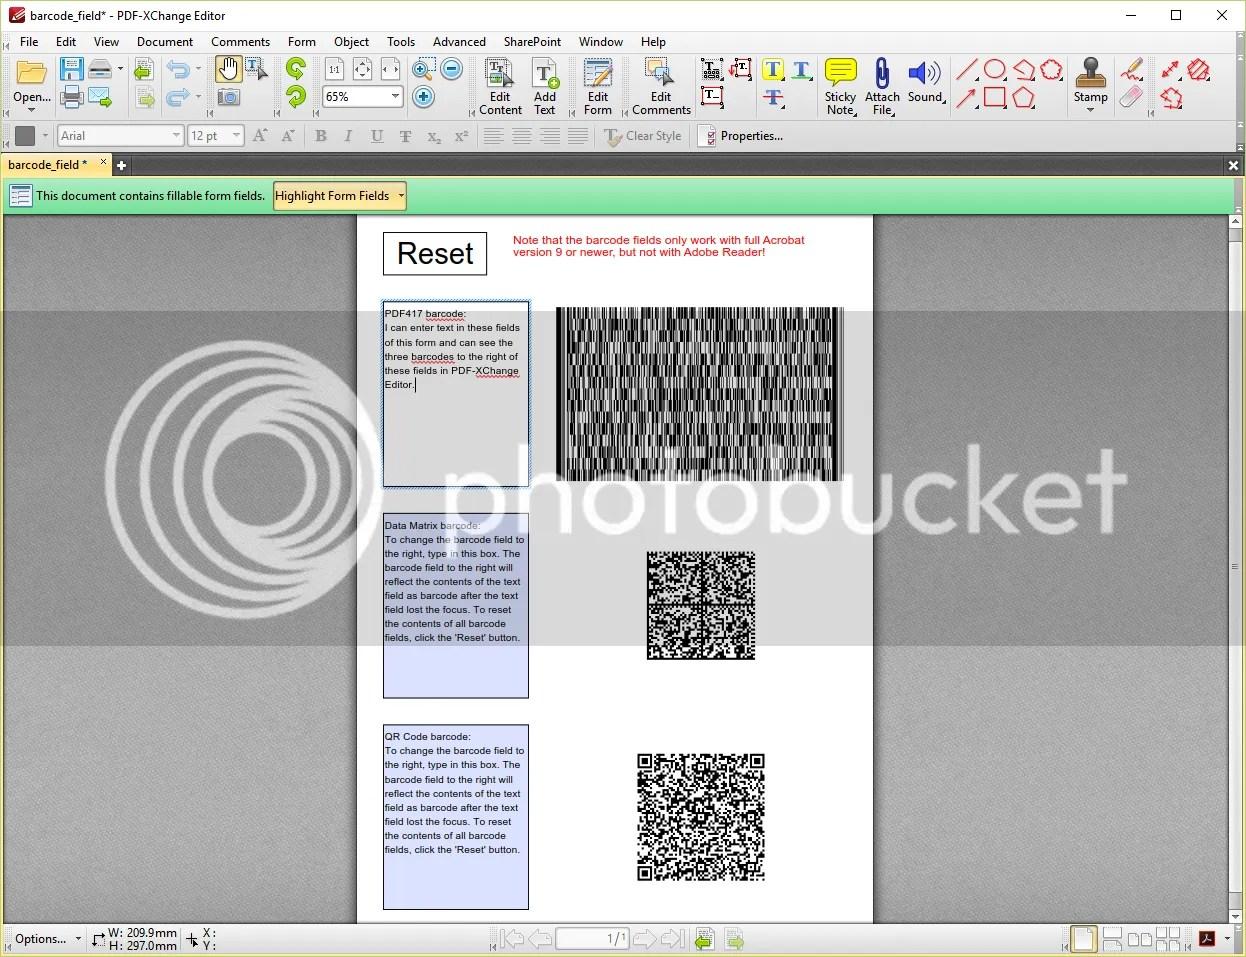 PDF-XChange Editor - barcode_field.pdf